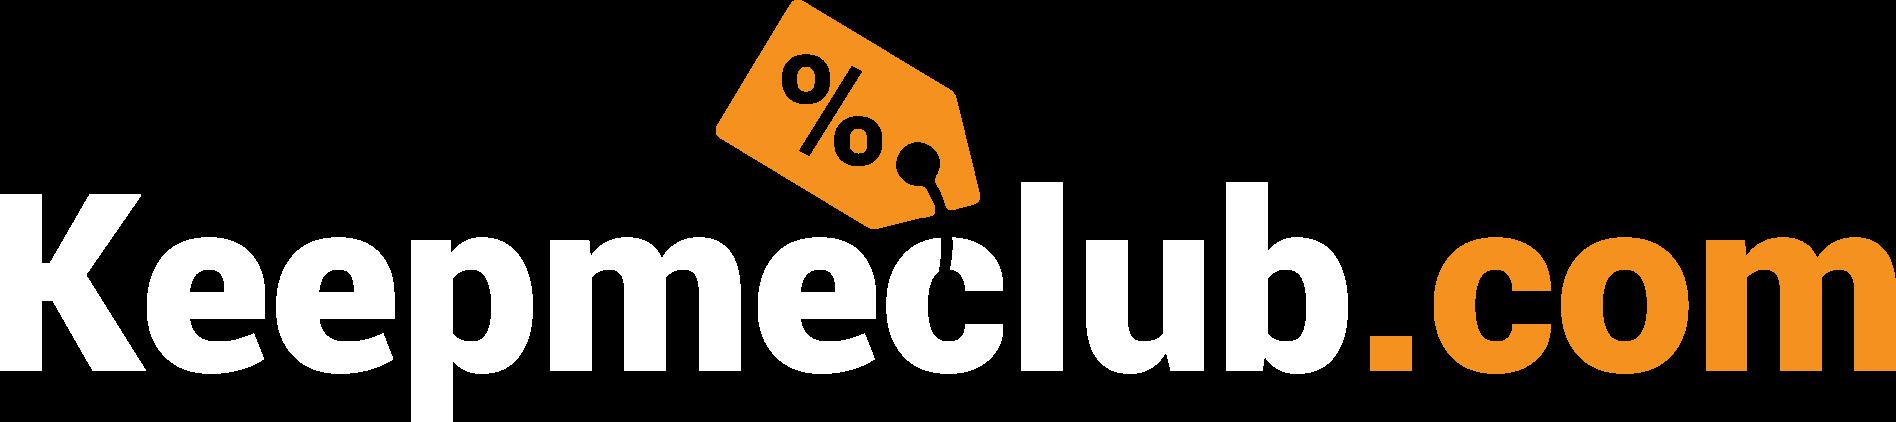 KeepMeClub.com